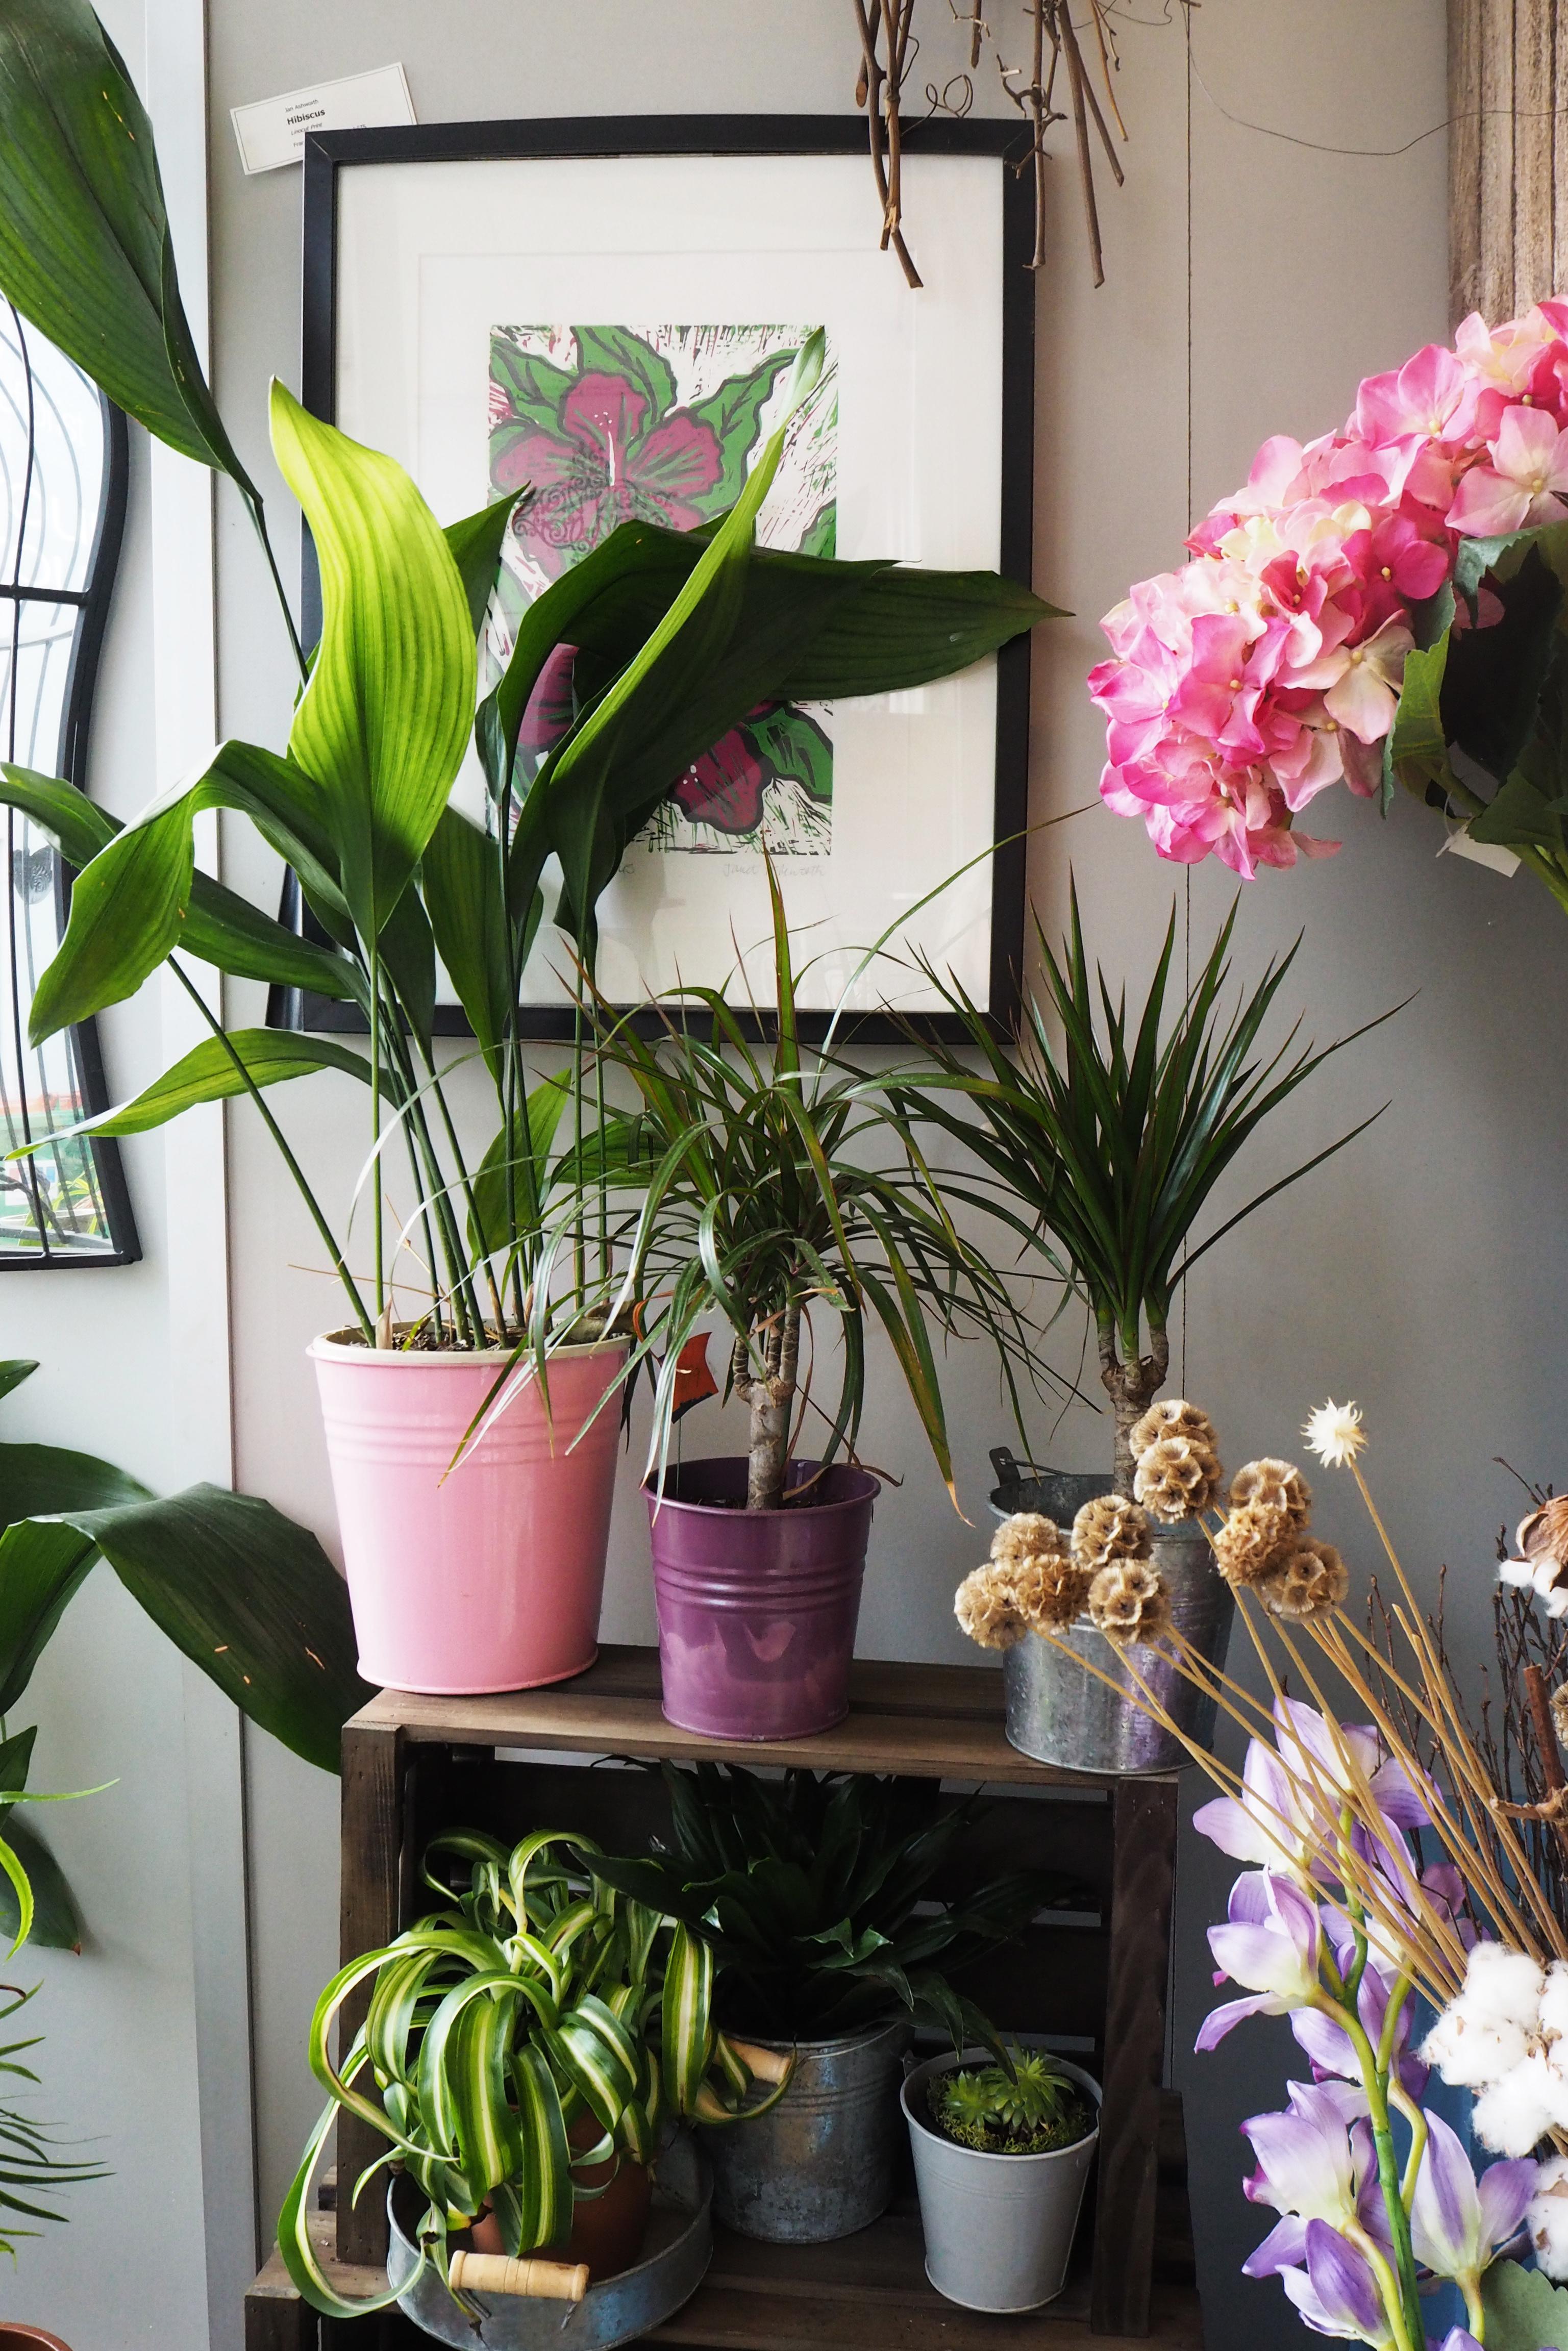 1970s houseplants - aspidistra and spider plant